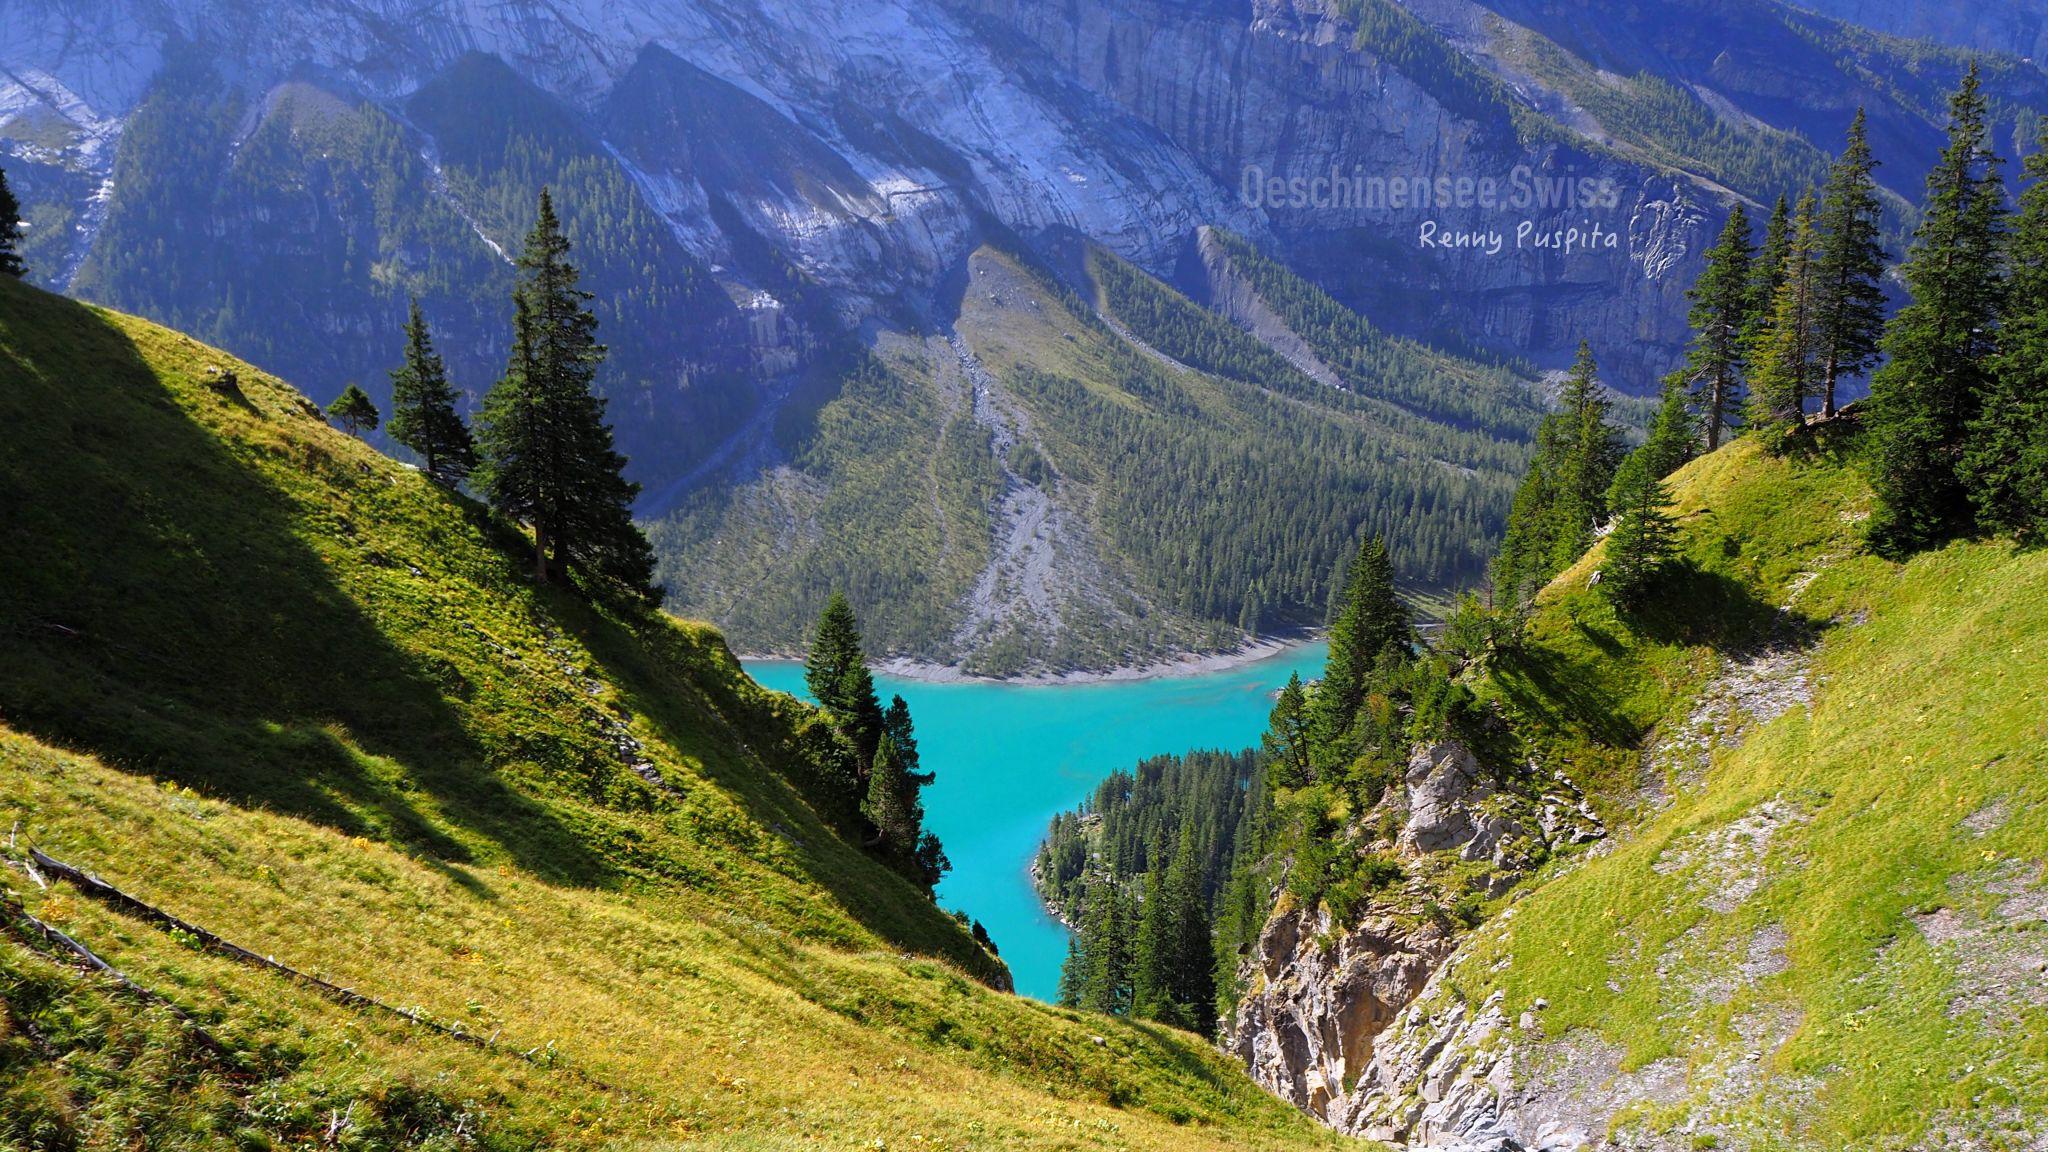 Oeschinensee, Switzerland, Switzerland